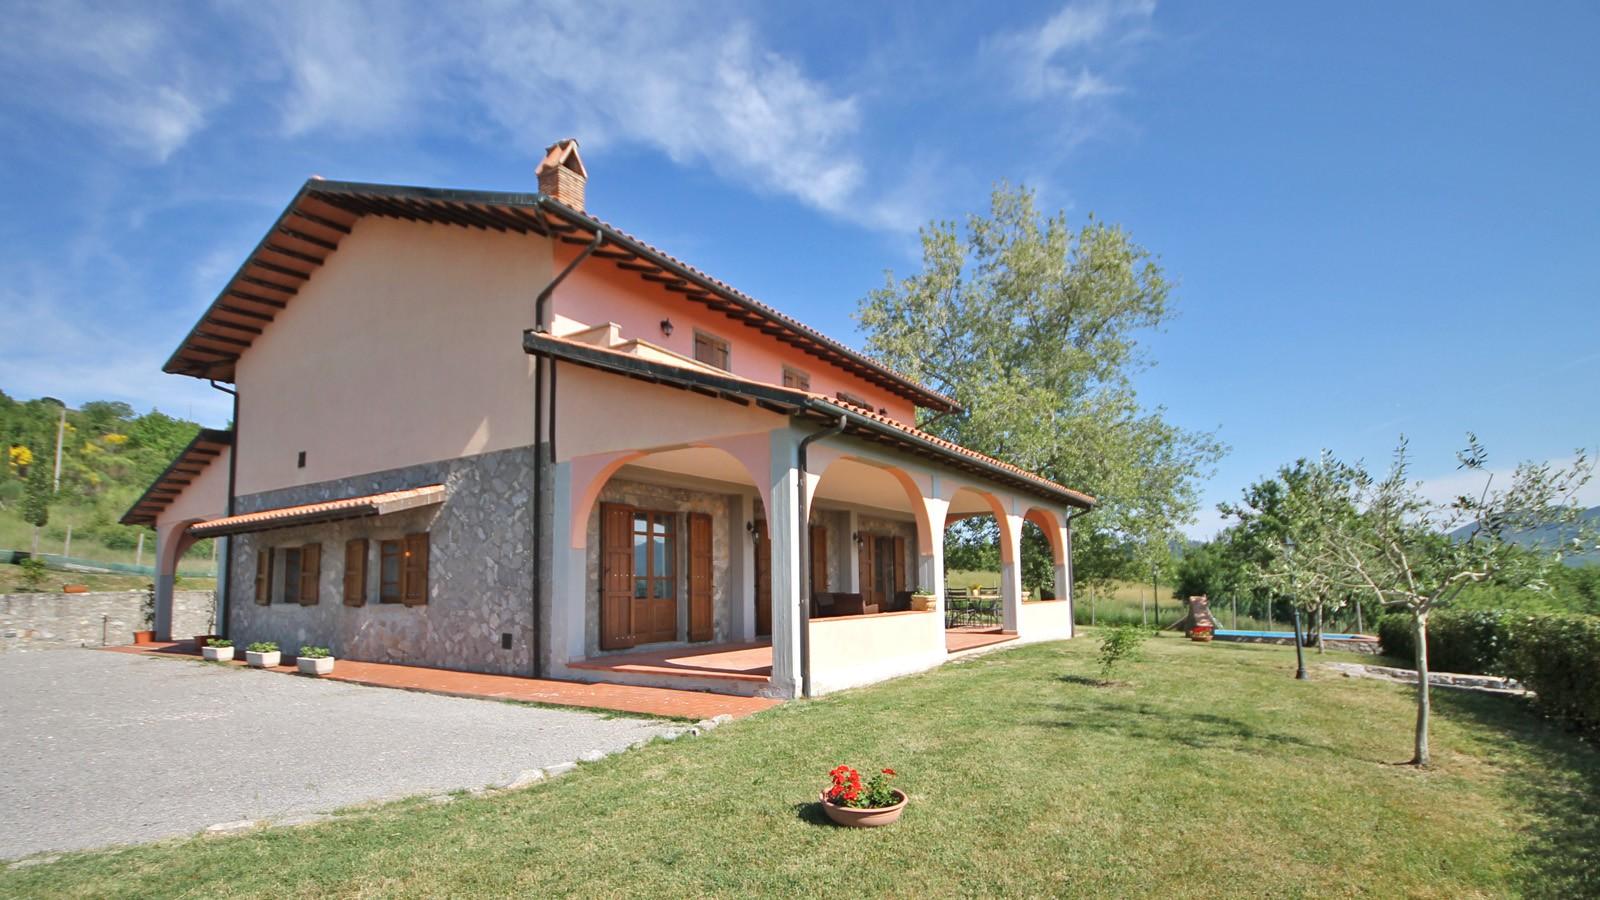 Toscana santa fiora villa in vendita house and houses for Toscana house